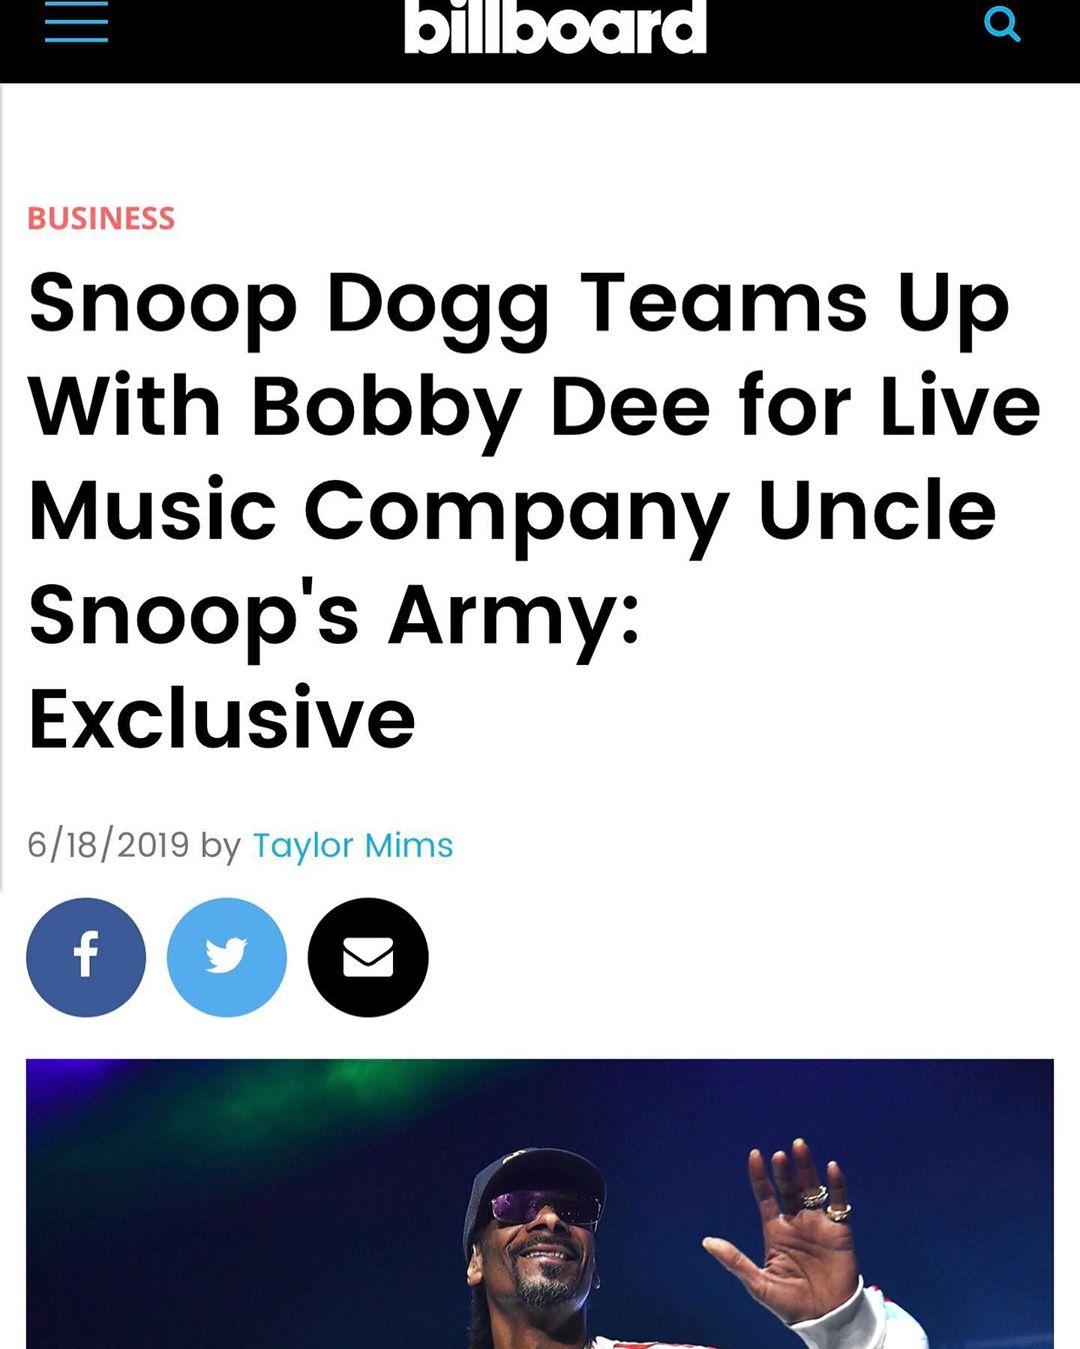 Snoop Dogg and Bobby Dee, get it! - Layzie Bone